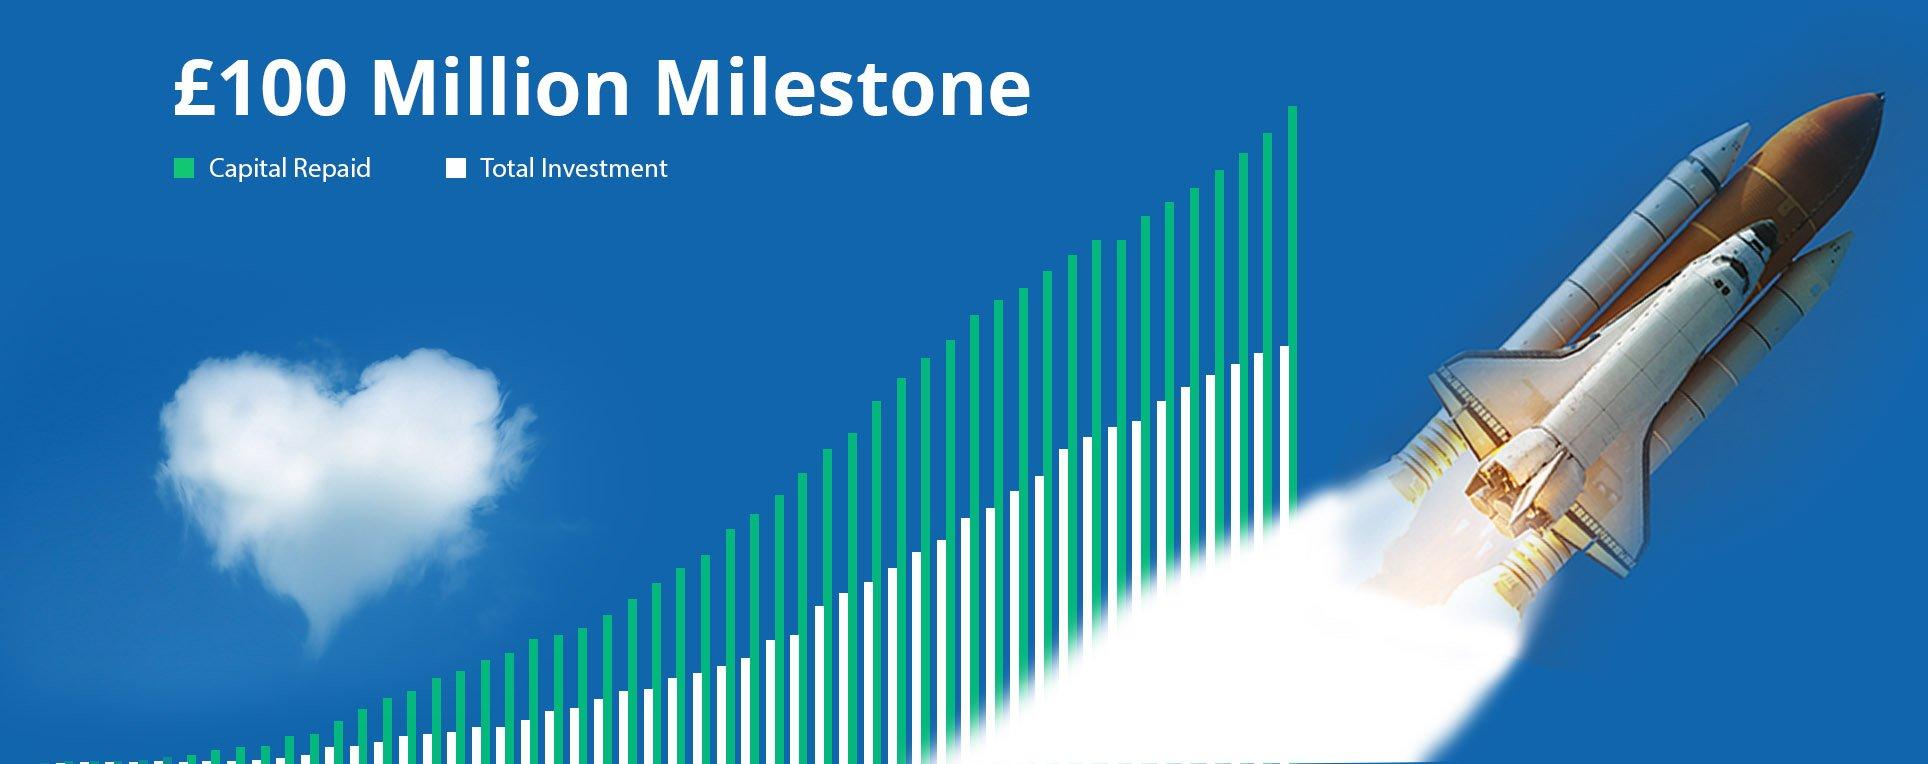 Kuflink, P2P Platform, Celebrates £100 Million Lending Milestone!